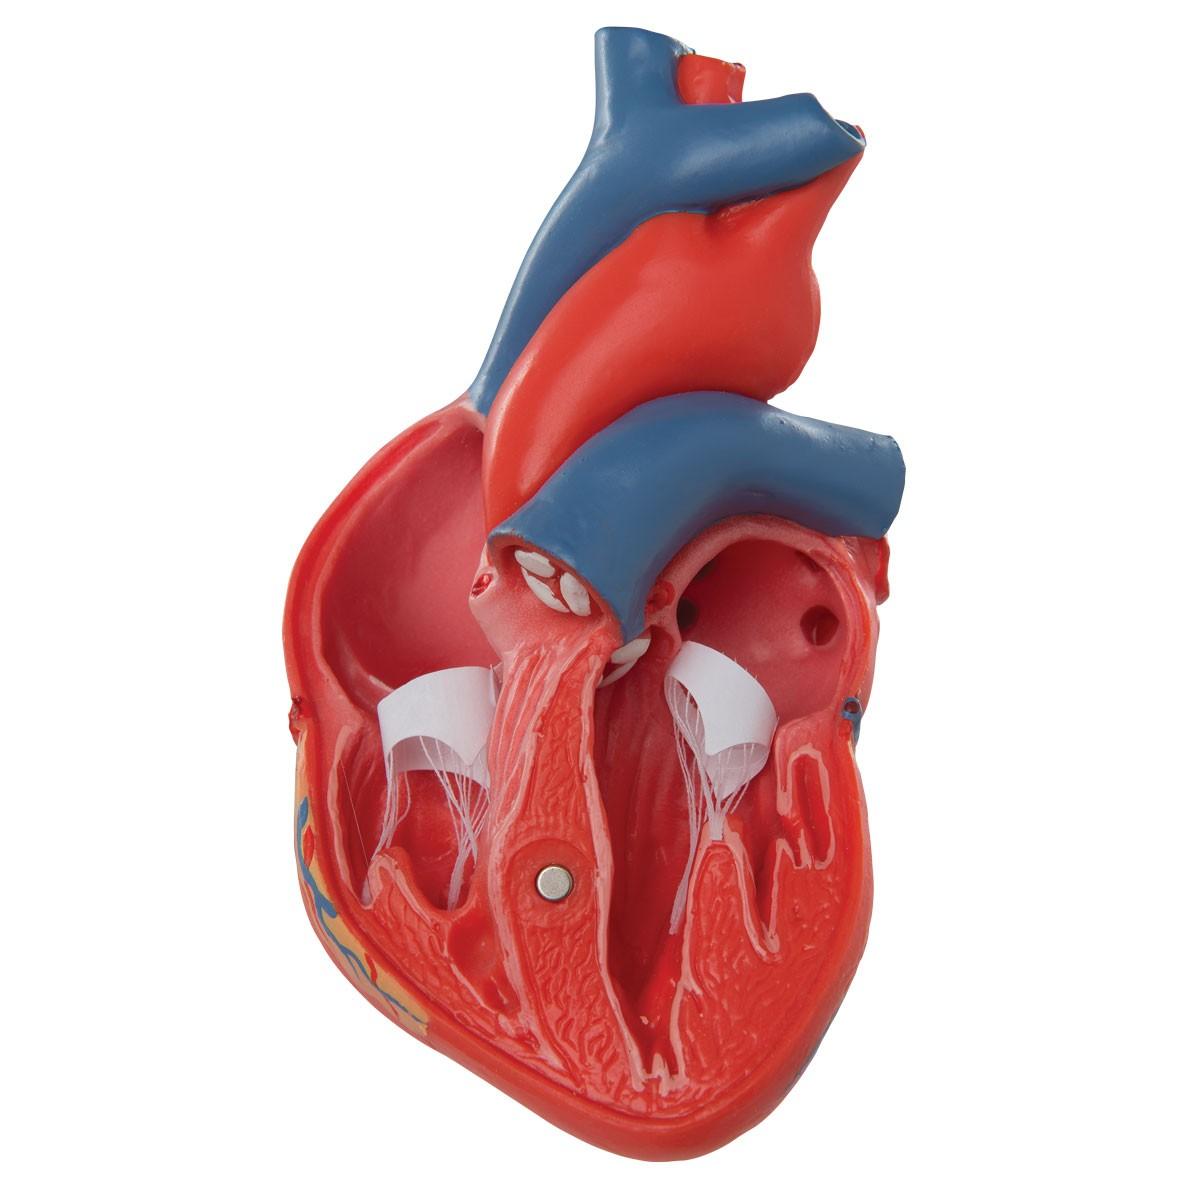 1200x1200 Anatomical Heart Model G08 Heart Anatomy Model 3b Scientific